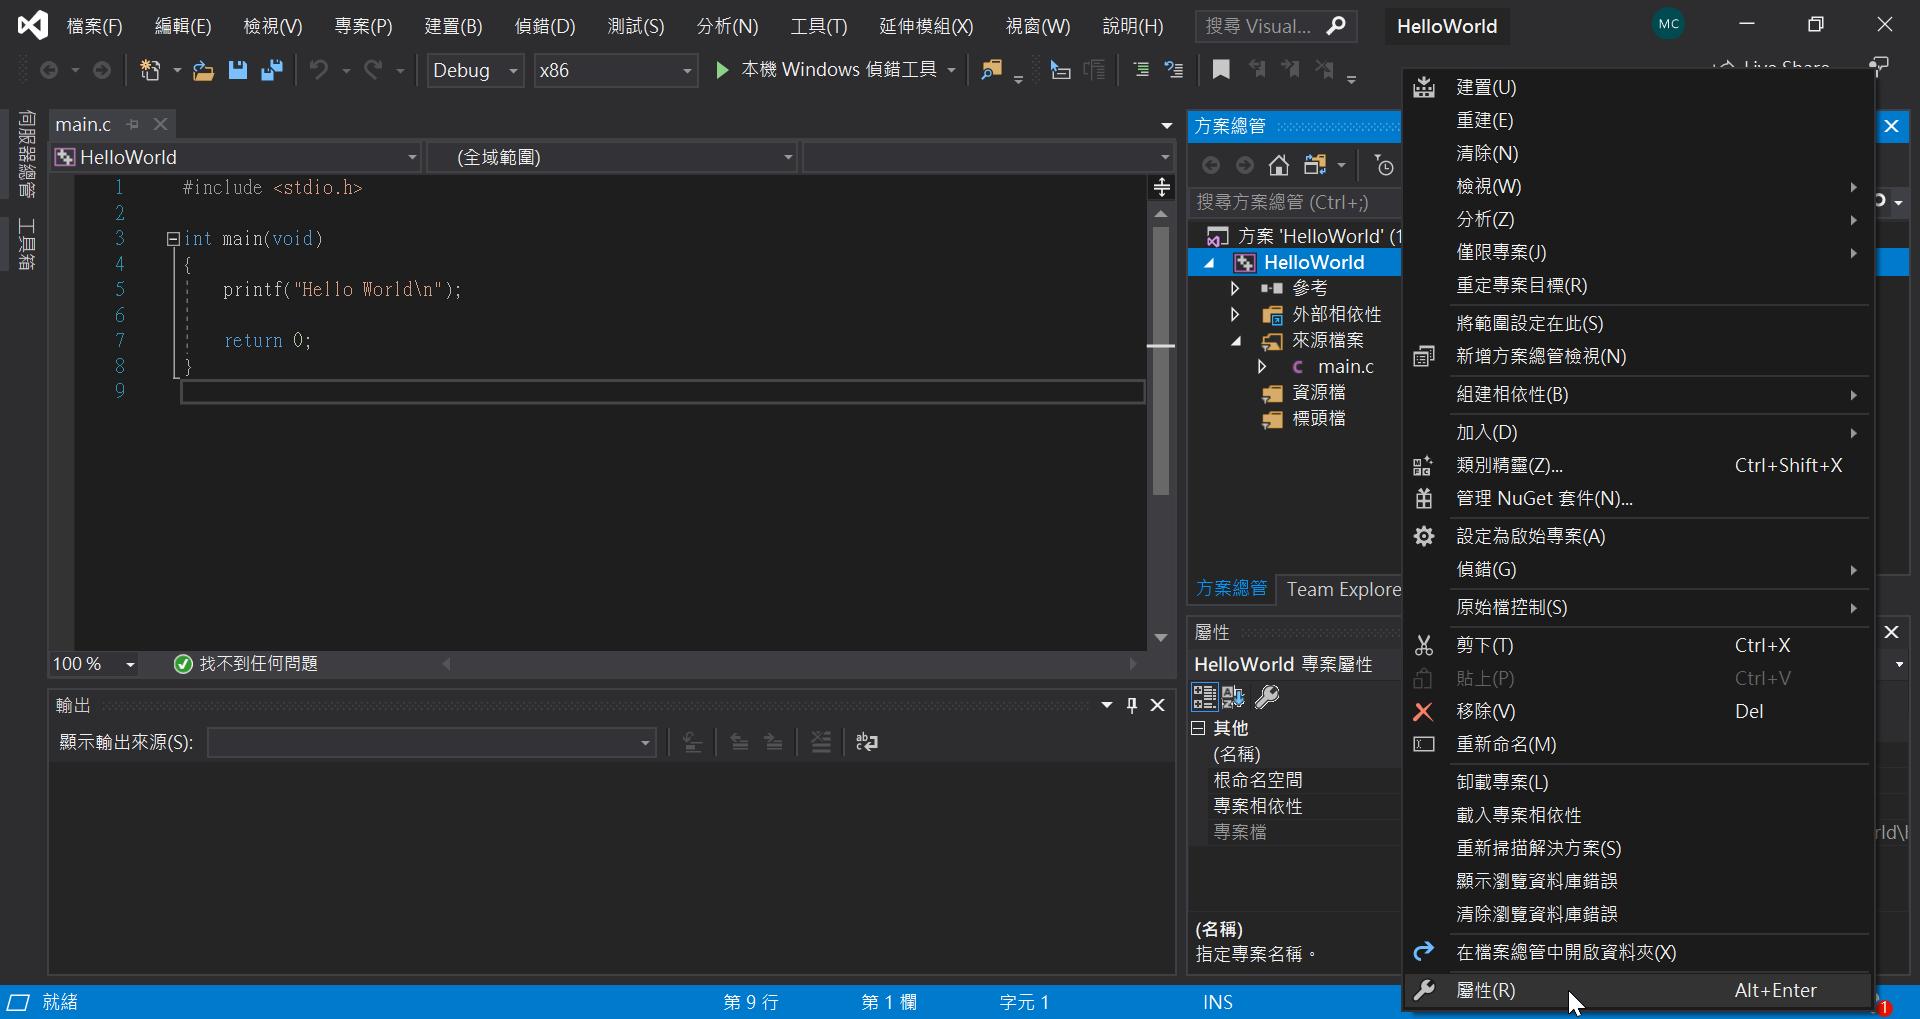 選擇 Visual Studio 2019 的專案屬性